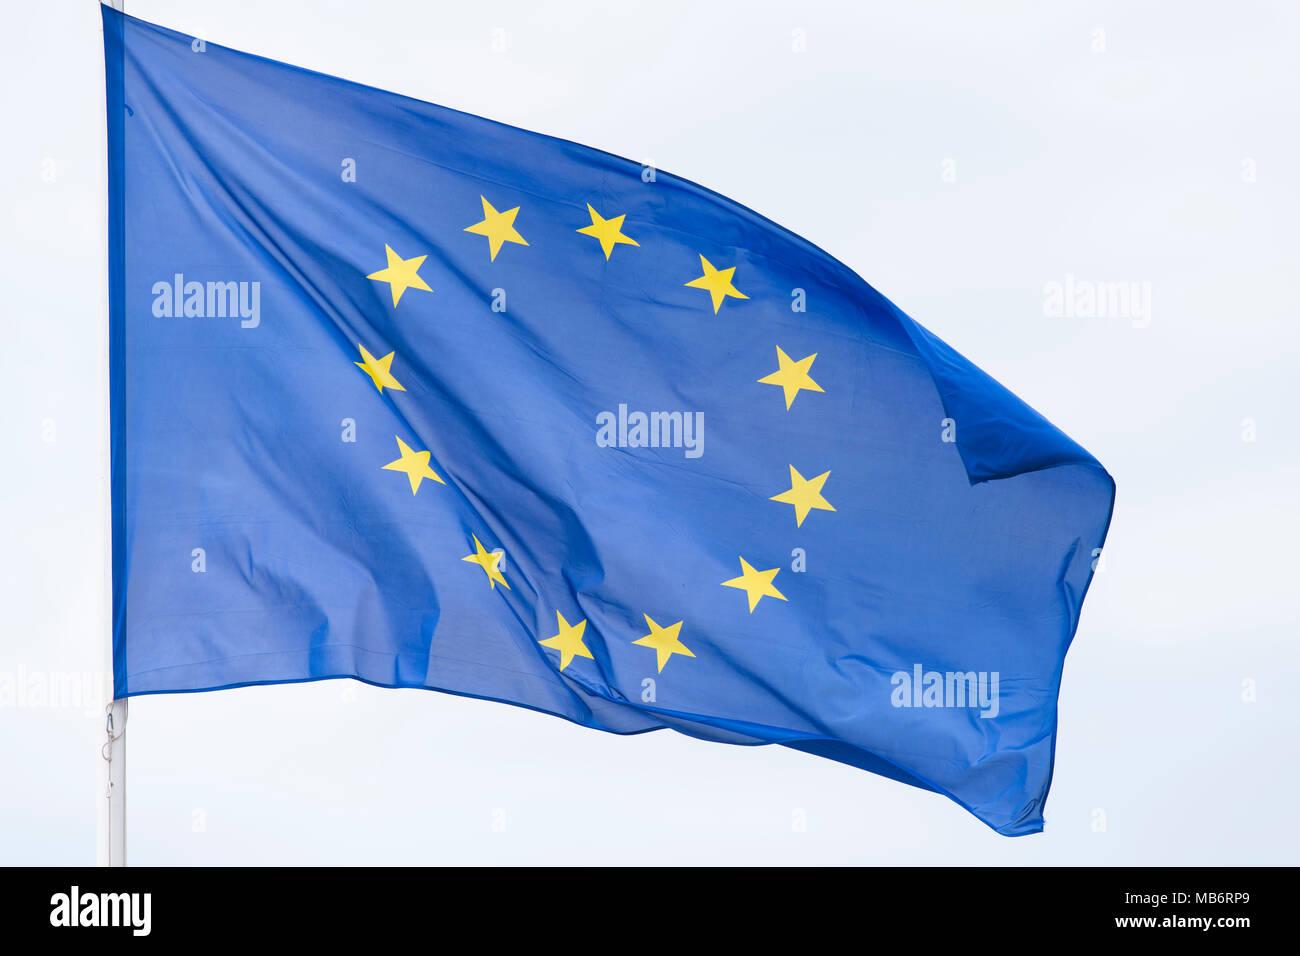 European Union (EU) flag flying in the wind. Stock Photo